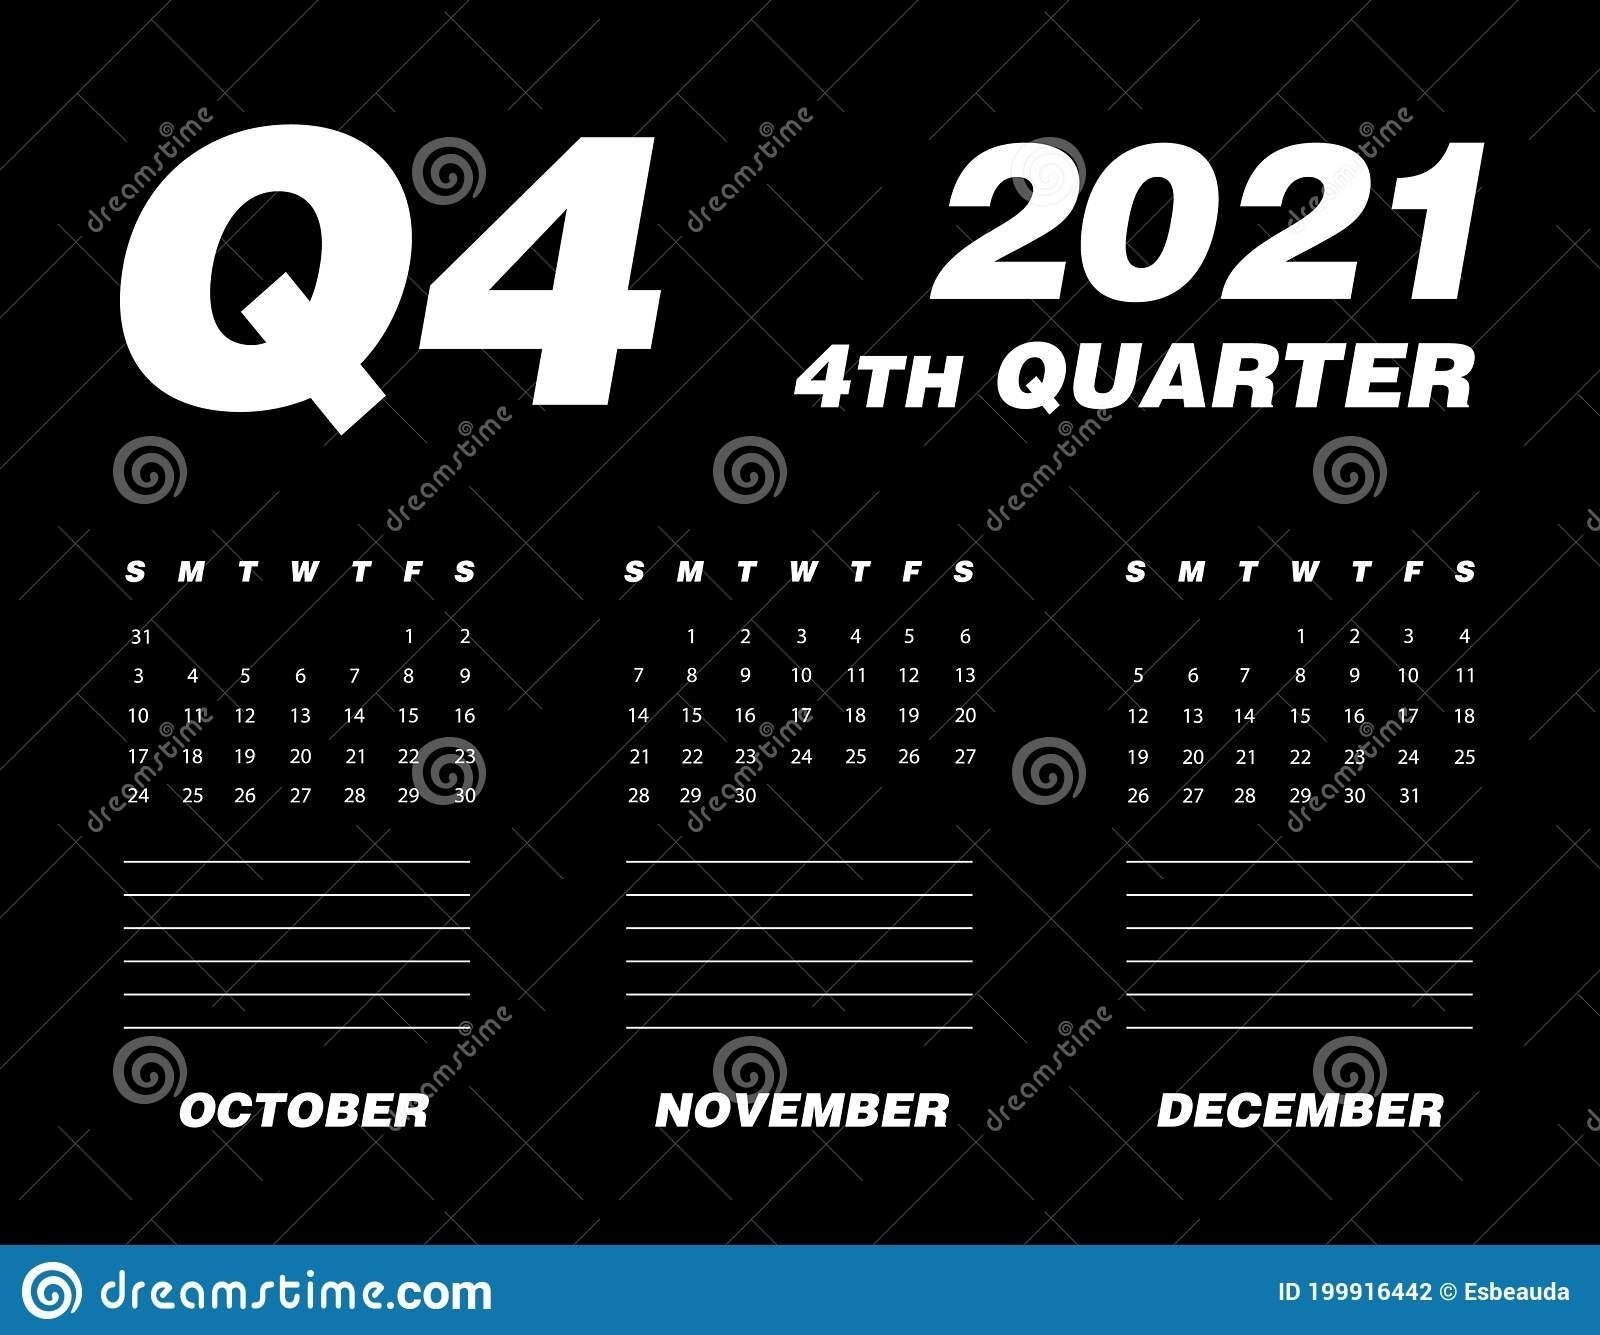 Fourth Quarter Of Calendar 2021 Stock Vector - Illustration